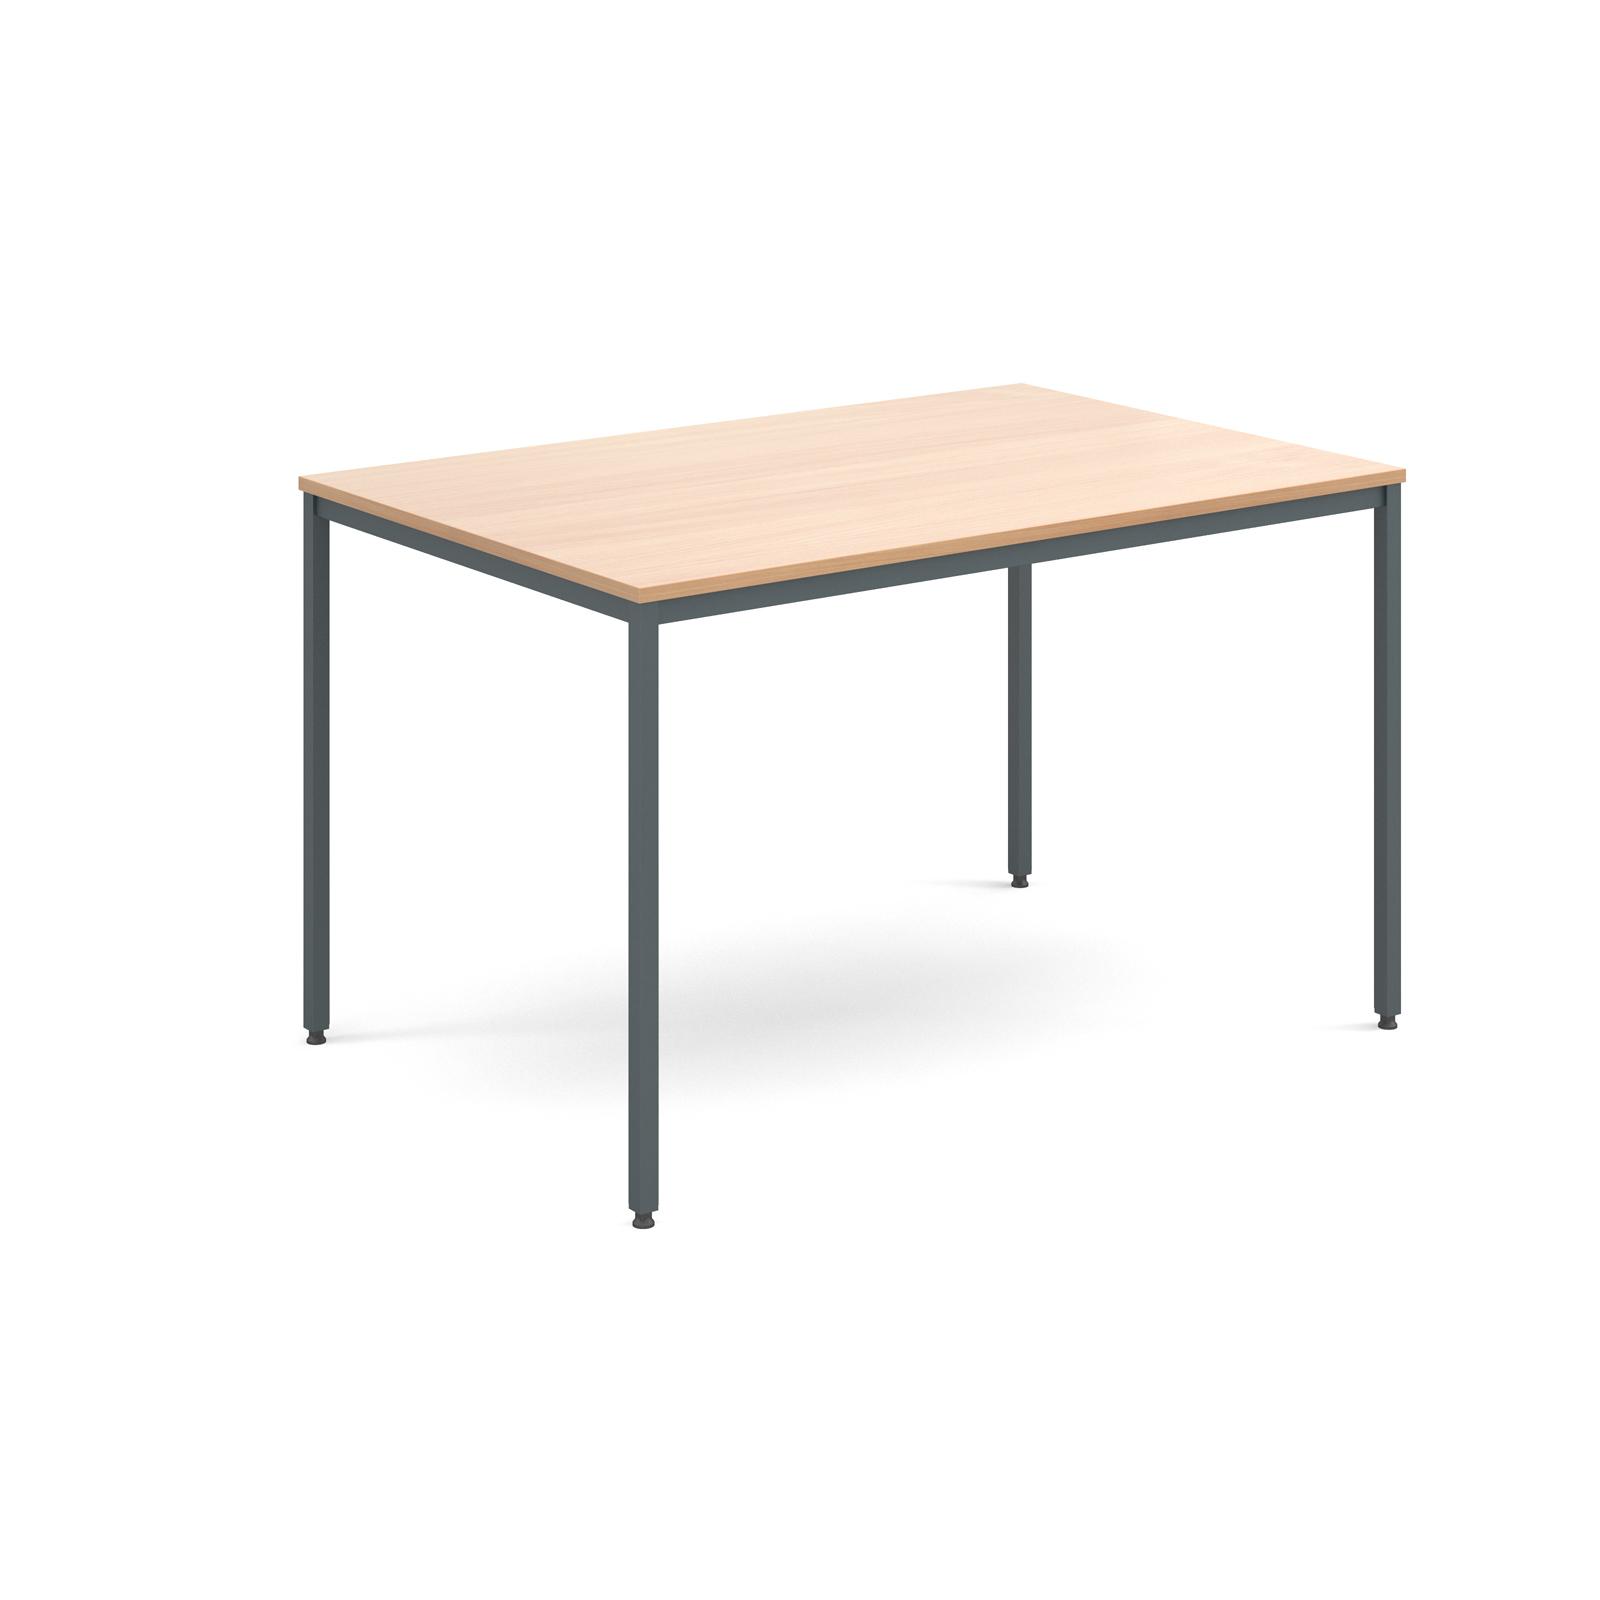 Rectangular flexi table with graphite frame